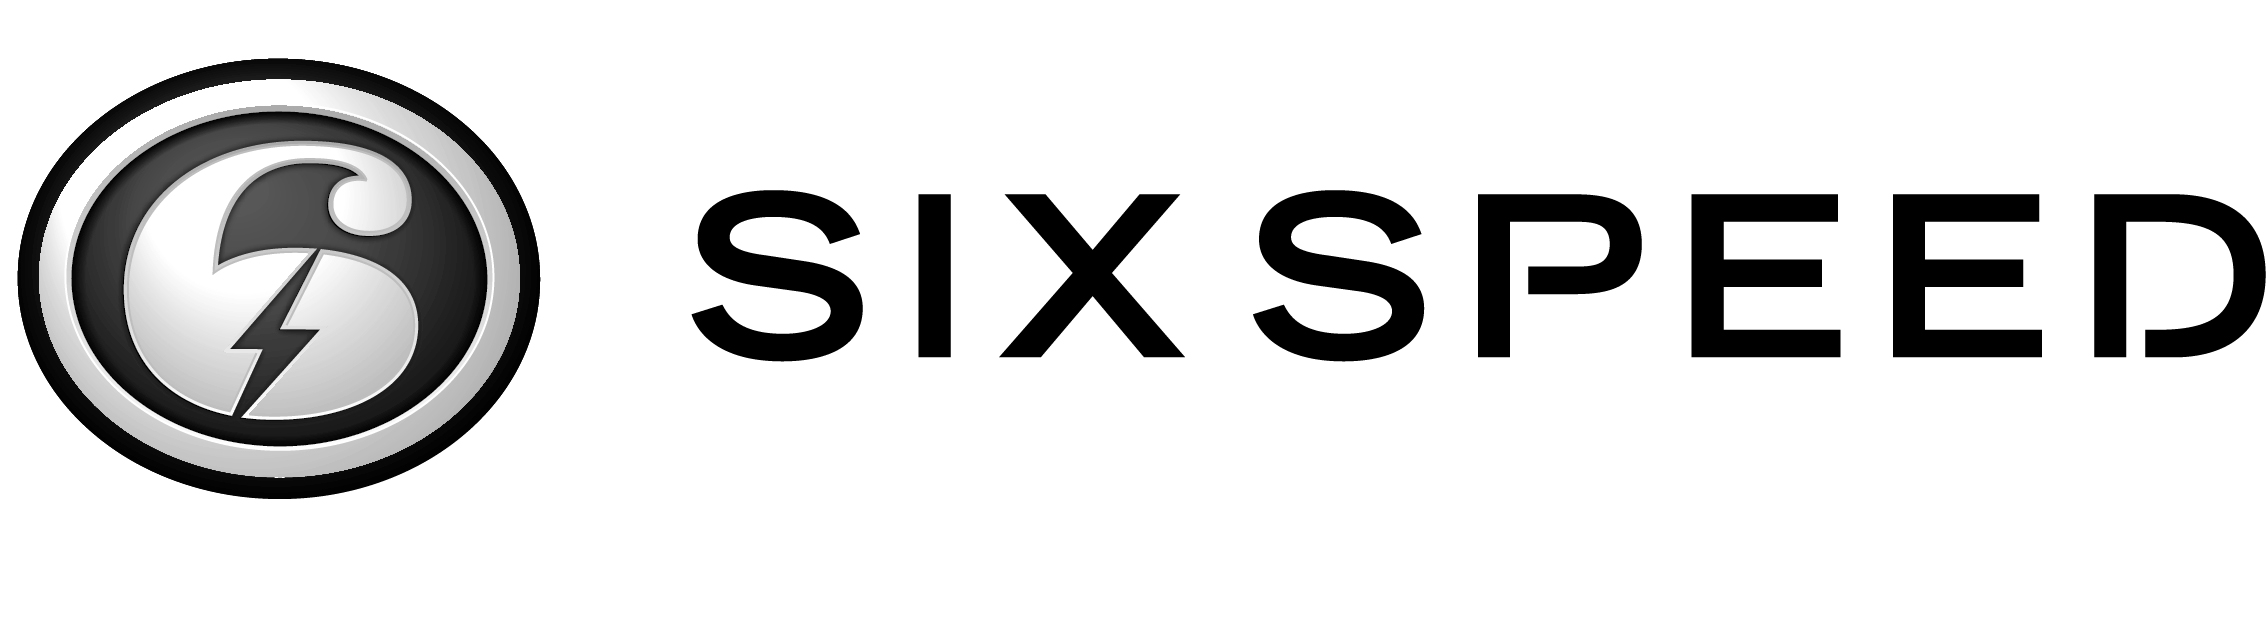 SixSpeed_LOGO (1)